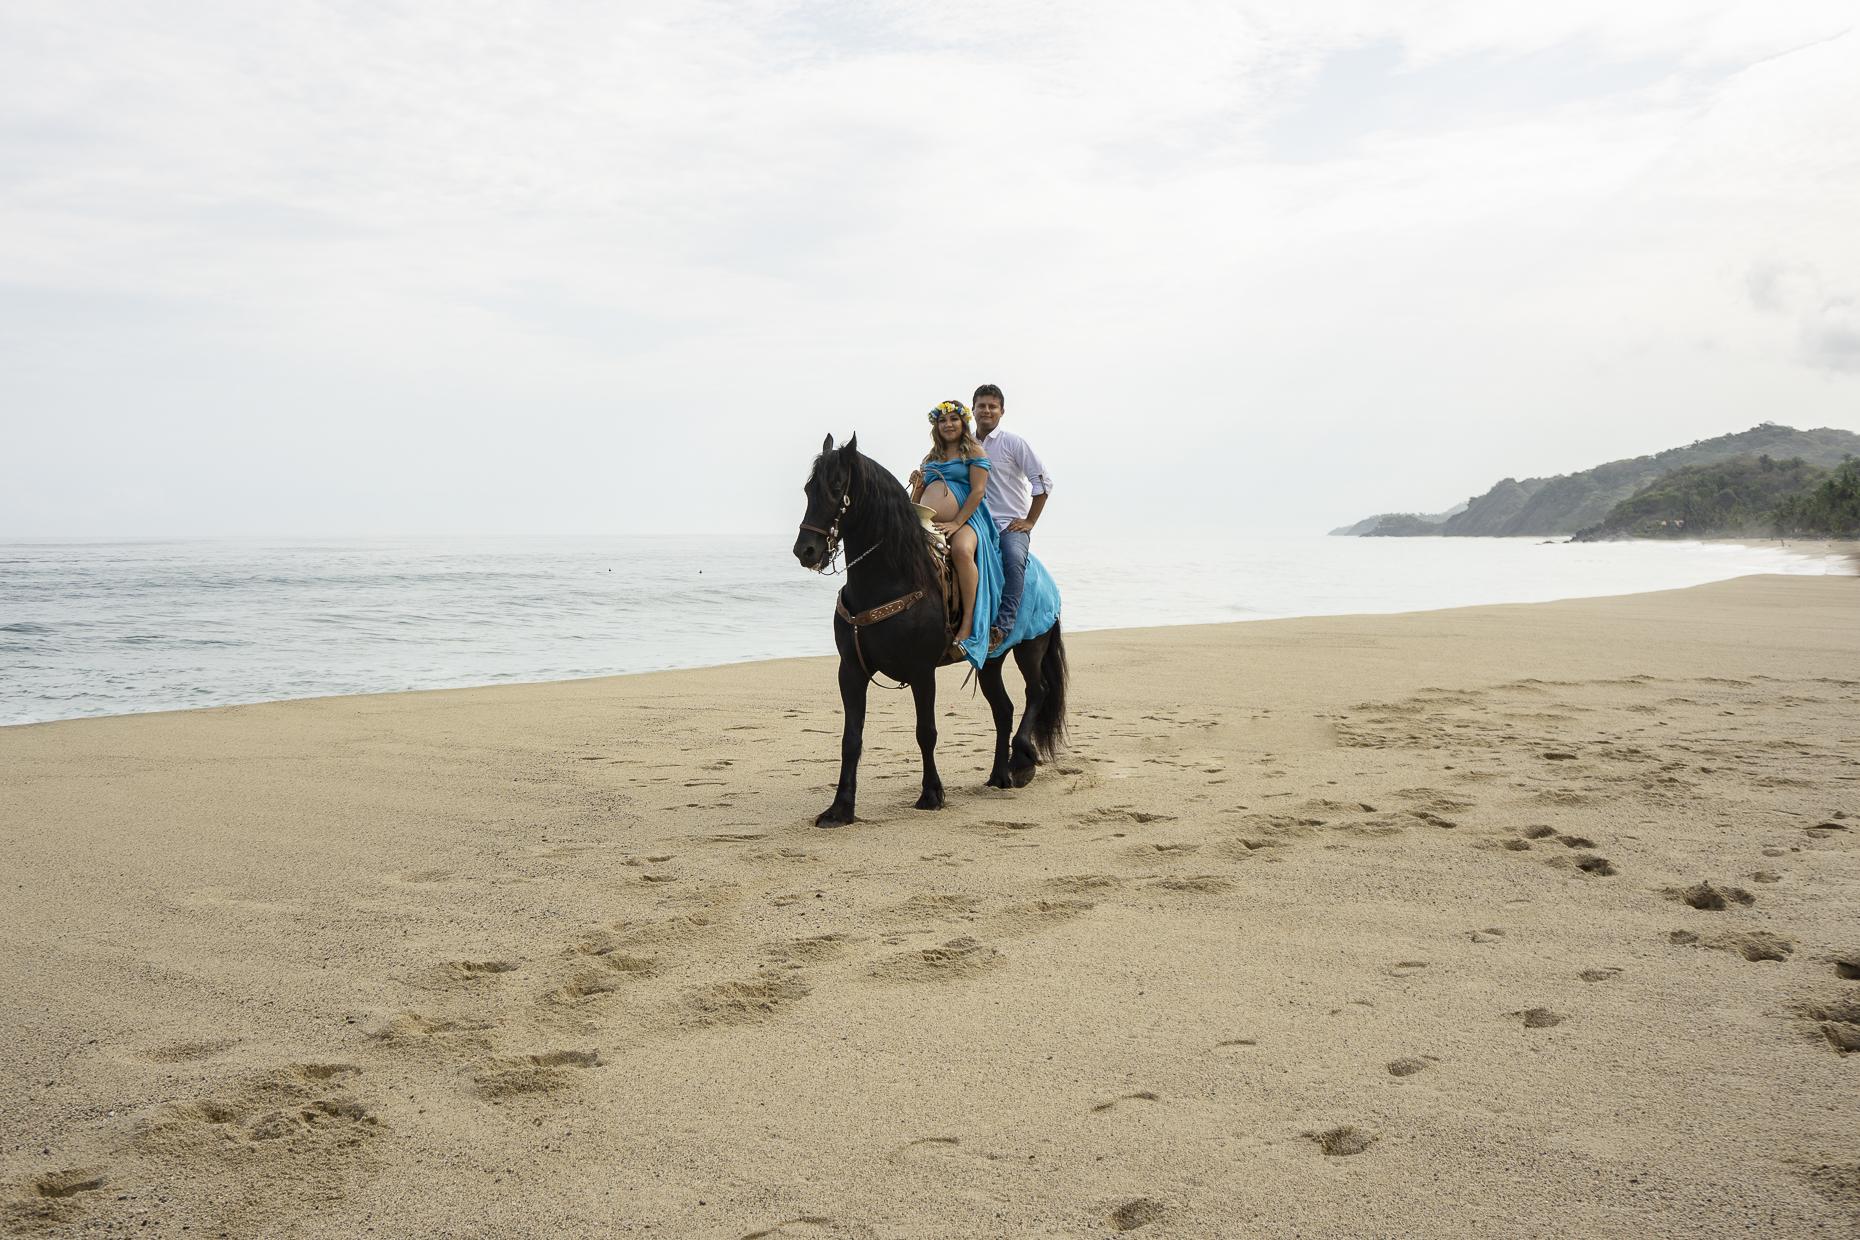 Fotografo--Puerto-Vallarta--Alex-y-Rebeca-Fotografia--Sayulita--Nayarit--Caballos--Playa--Familia--Embarazo--Lifestyle--Maternidad---42